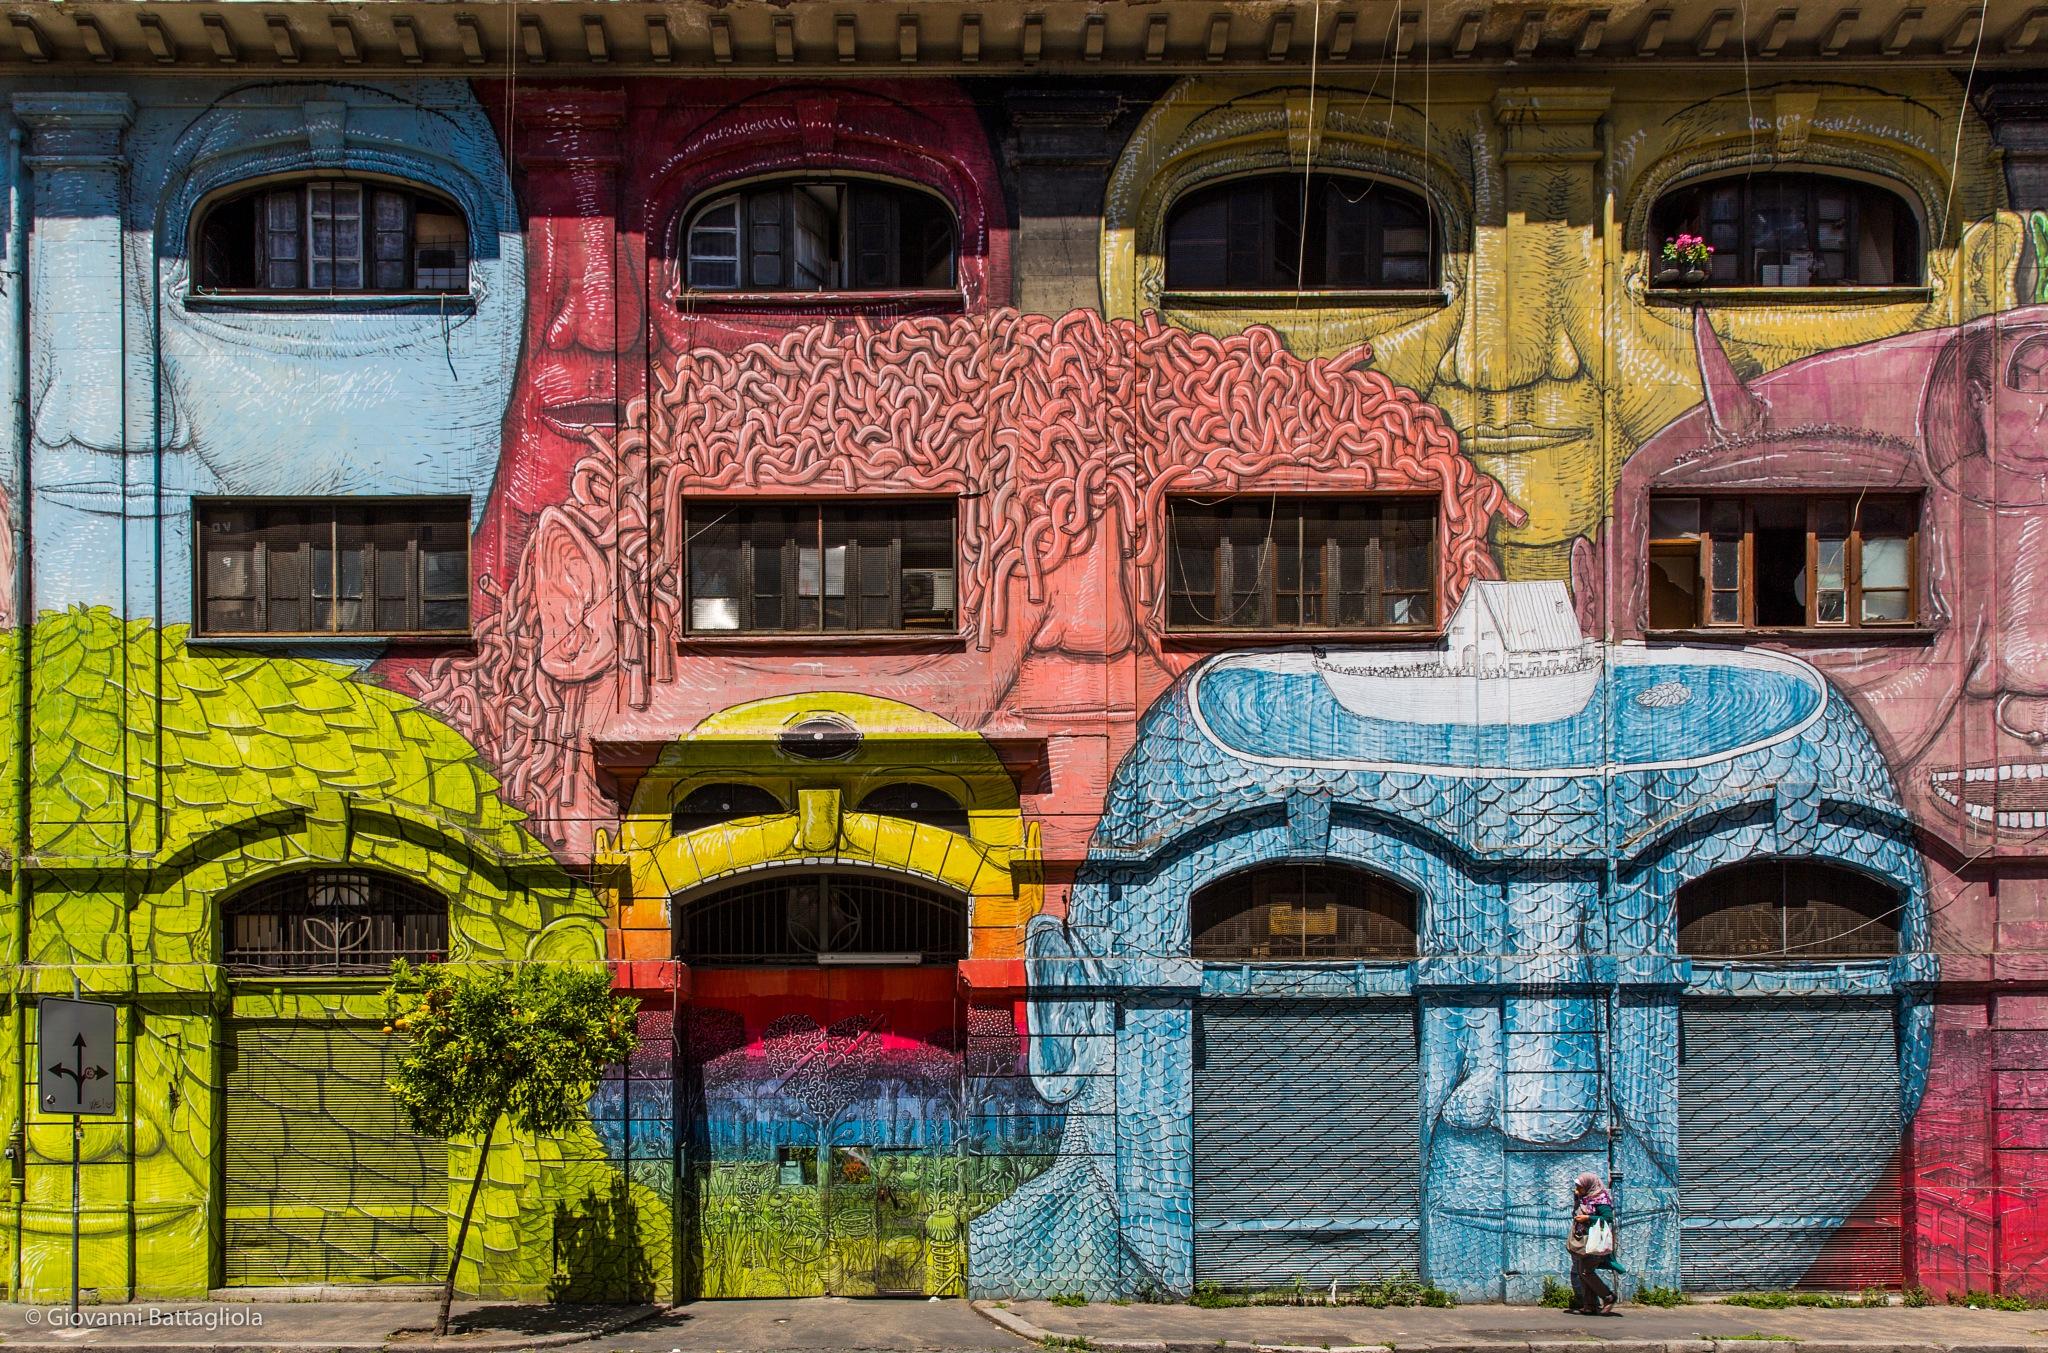 Walking in the city by Giovanni Battagliola